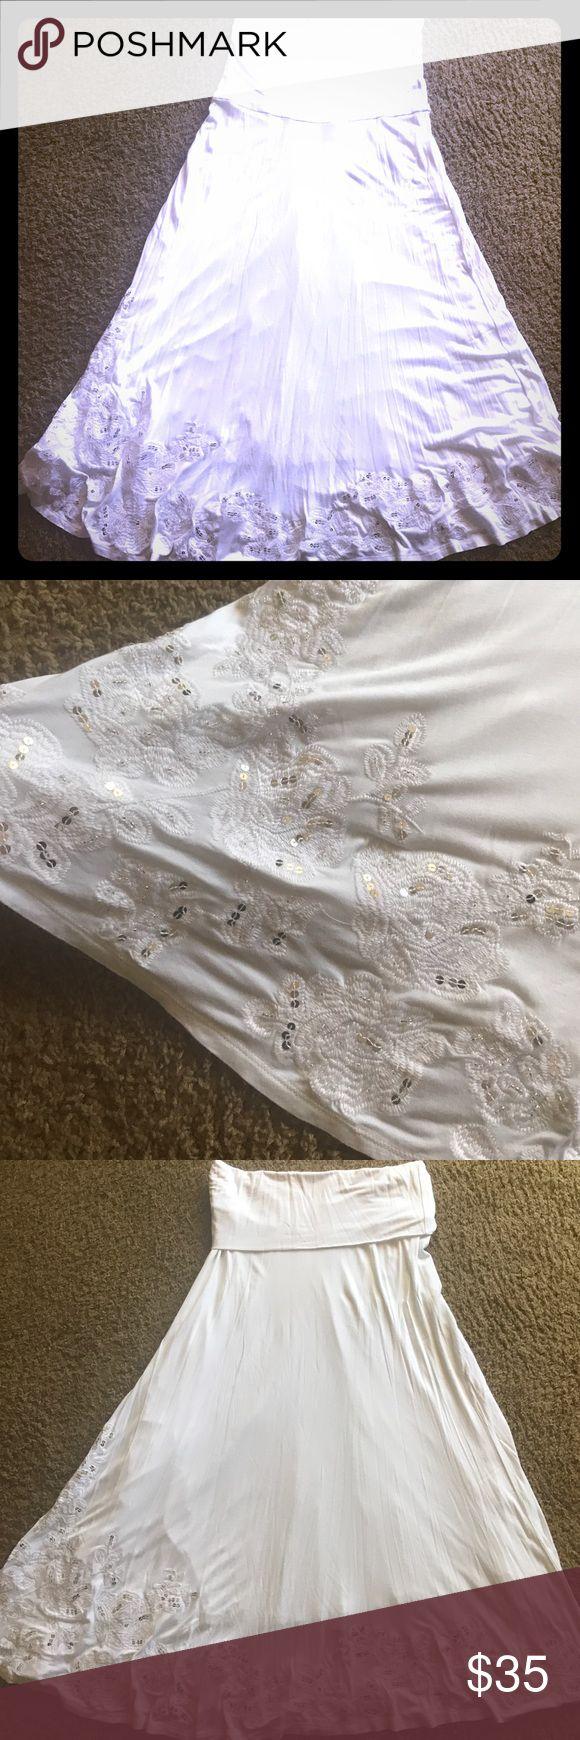 White apron macy's - I N C Convertible Maxi Dress White Strapless Convertible Maxi Dress With Embellished Hem Along Bottom